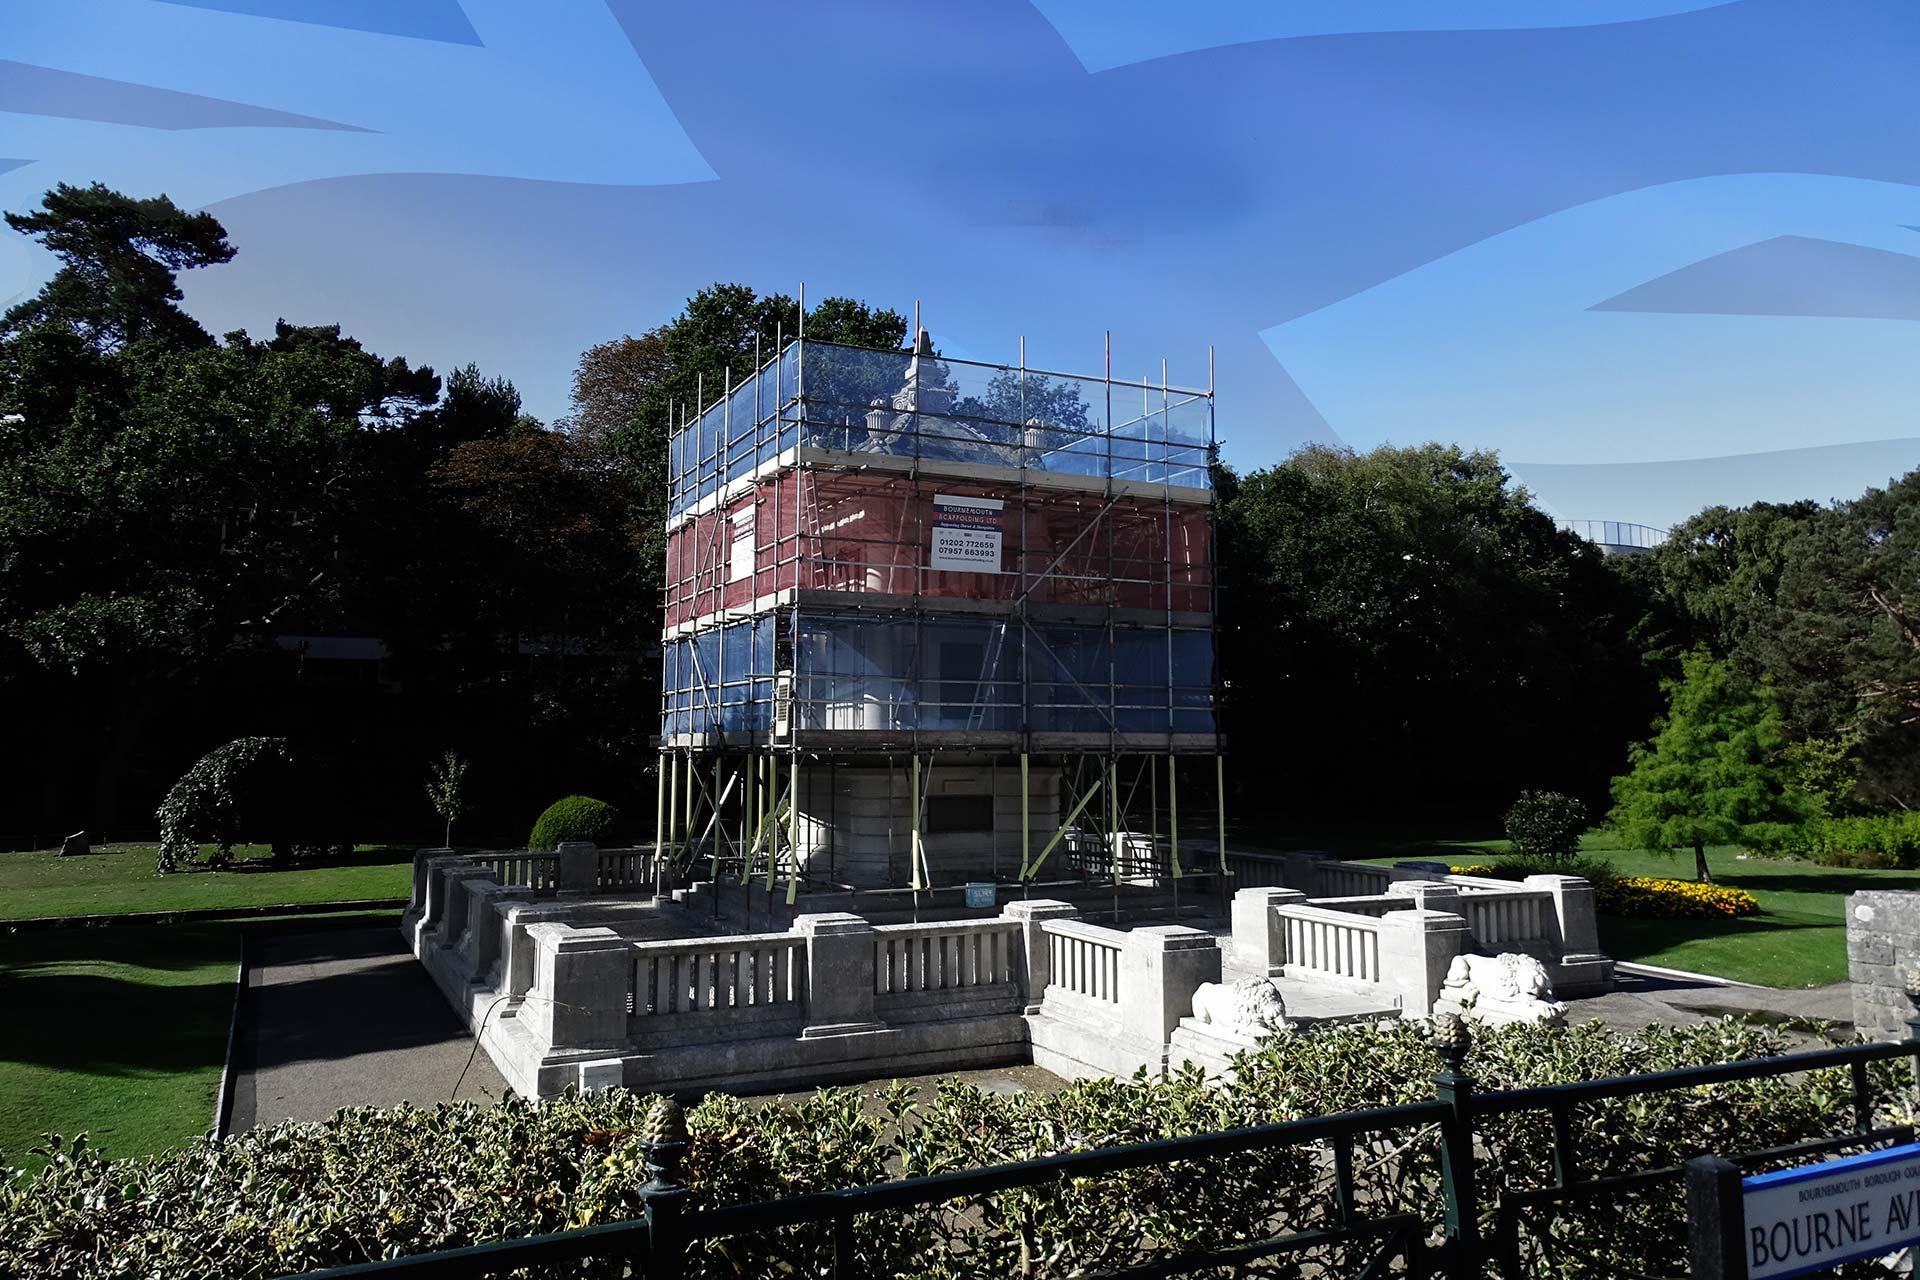 Slide - Bournemouth Gardens Cenotaph Scaffolding